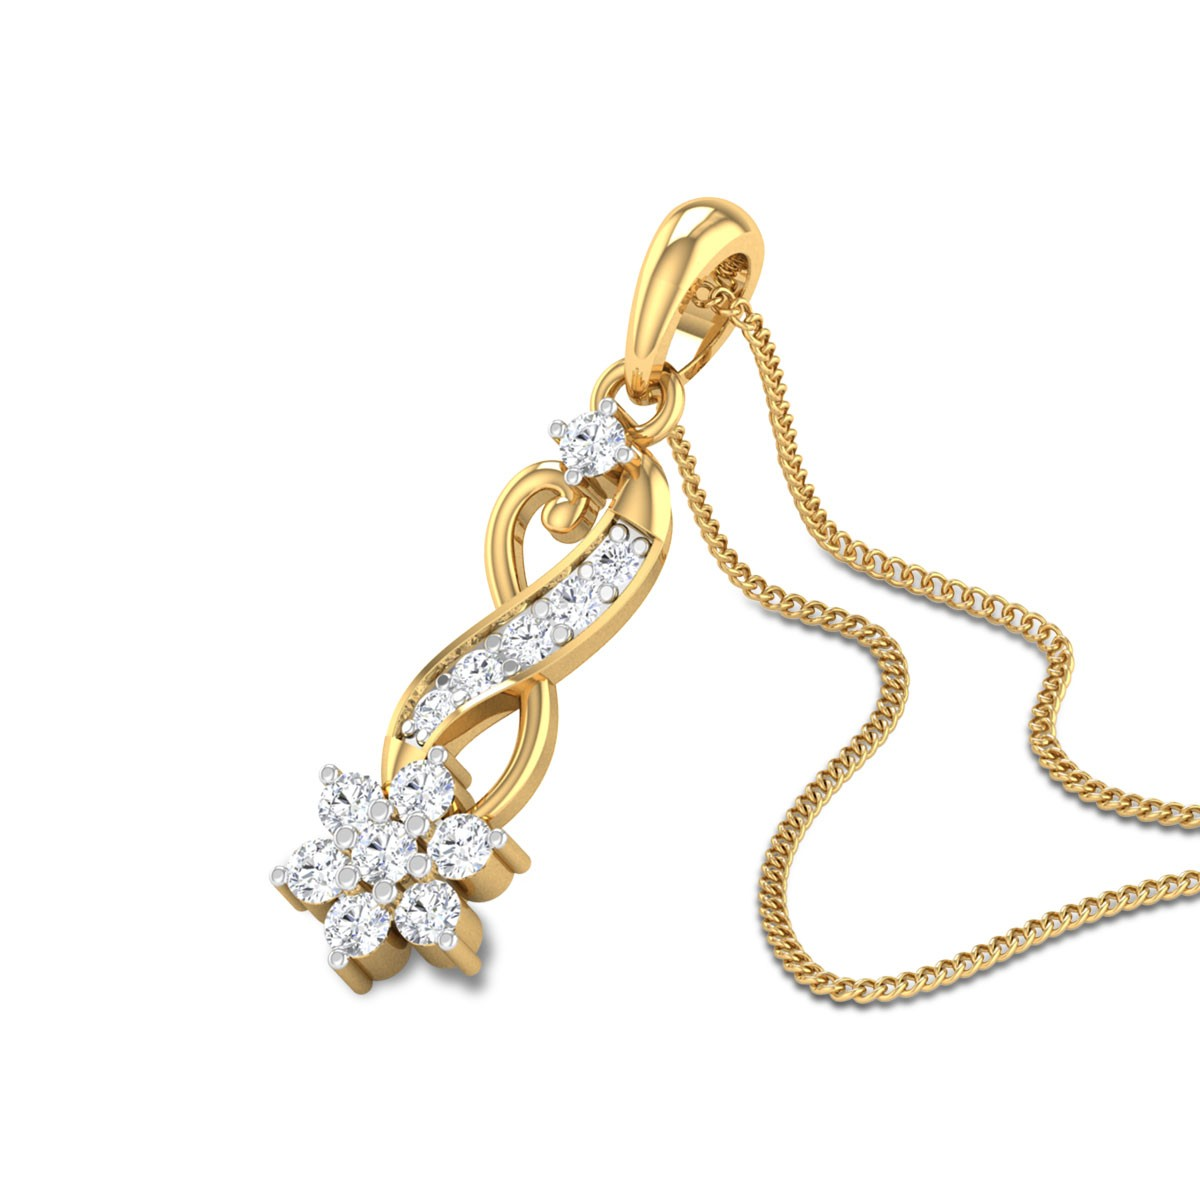 Penn Floral Diamond Pendant